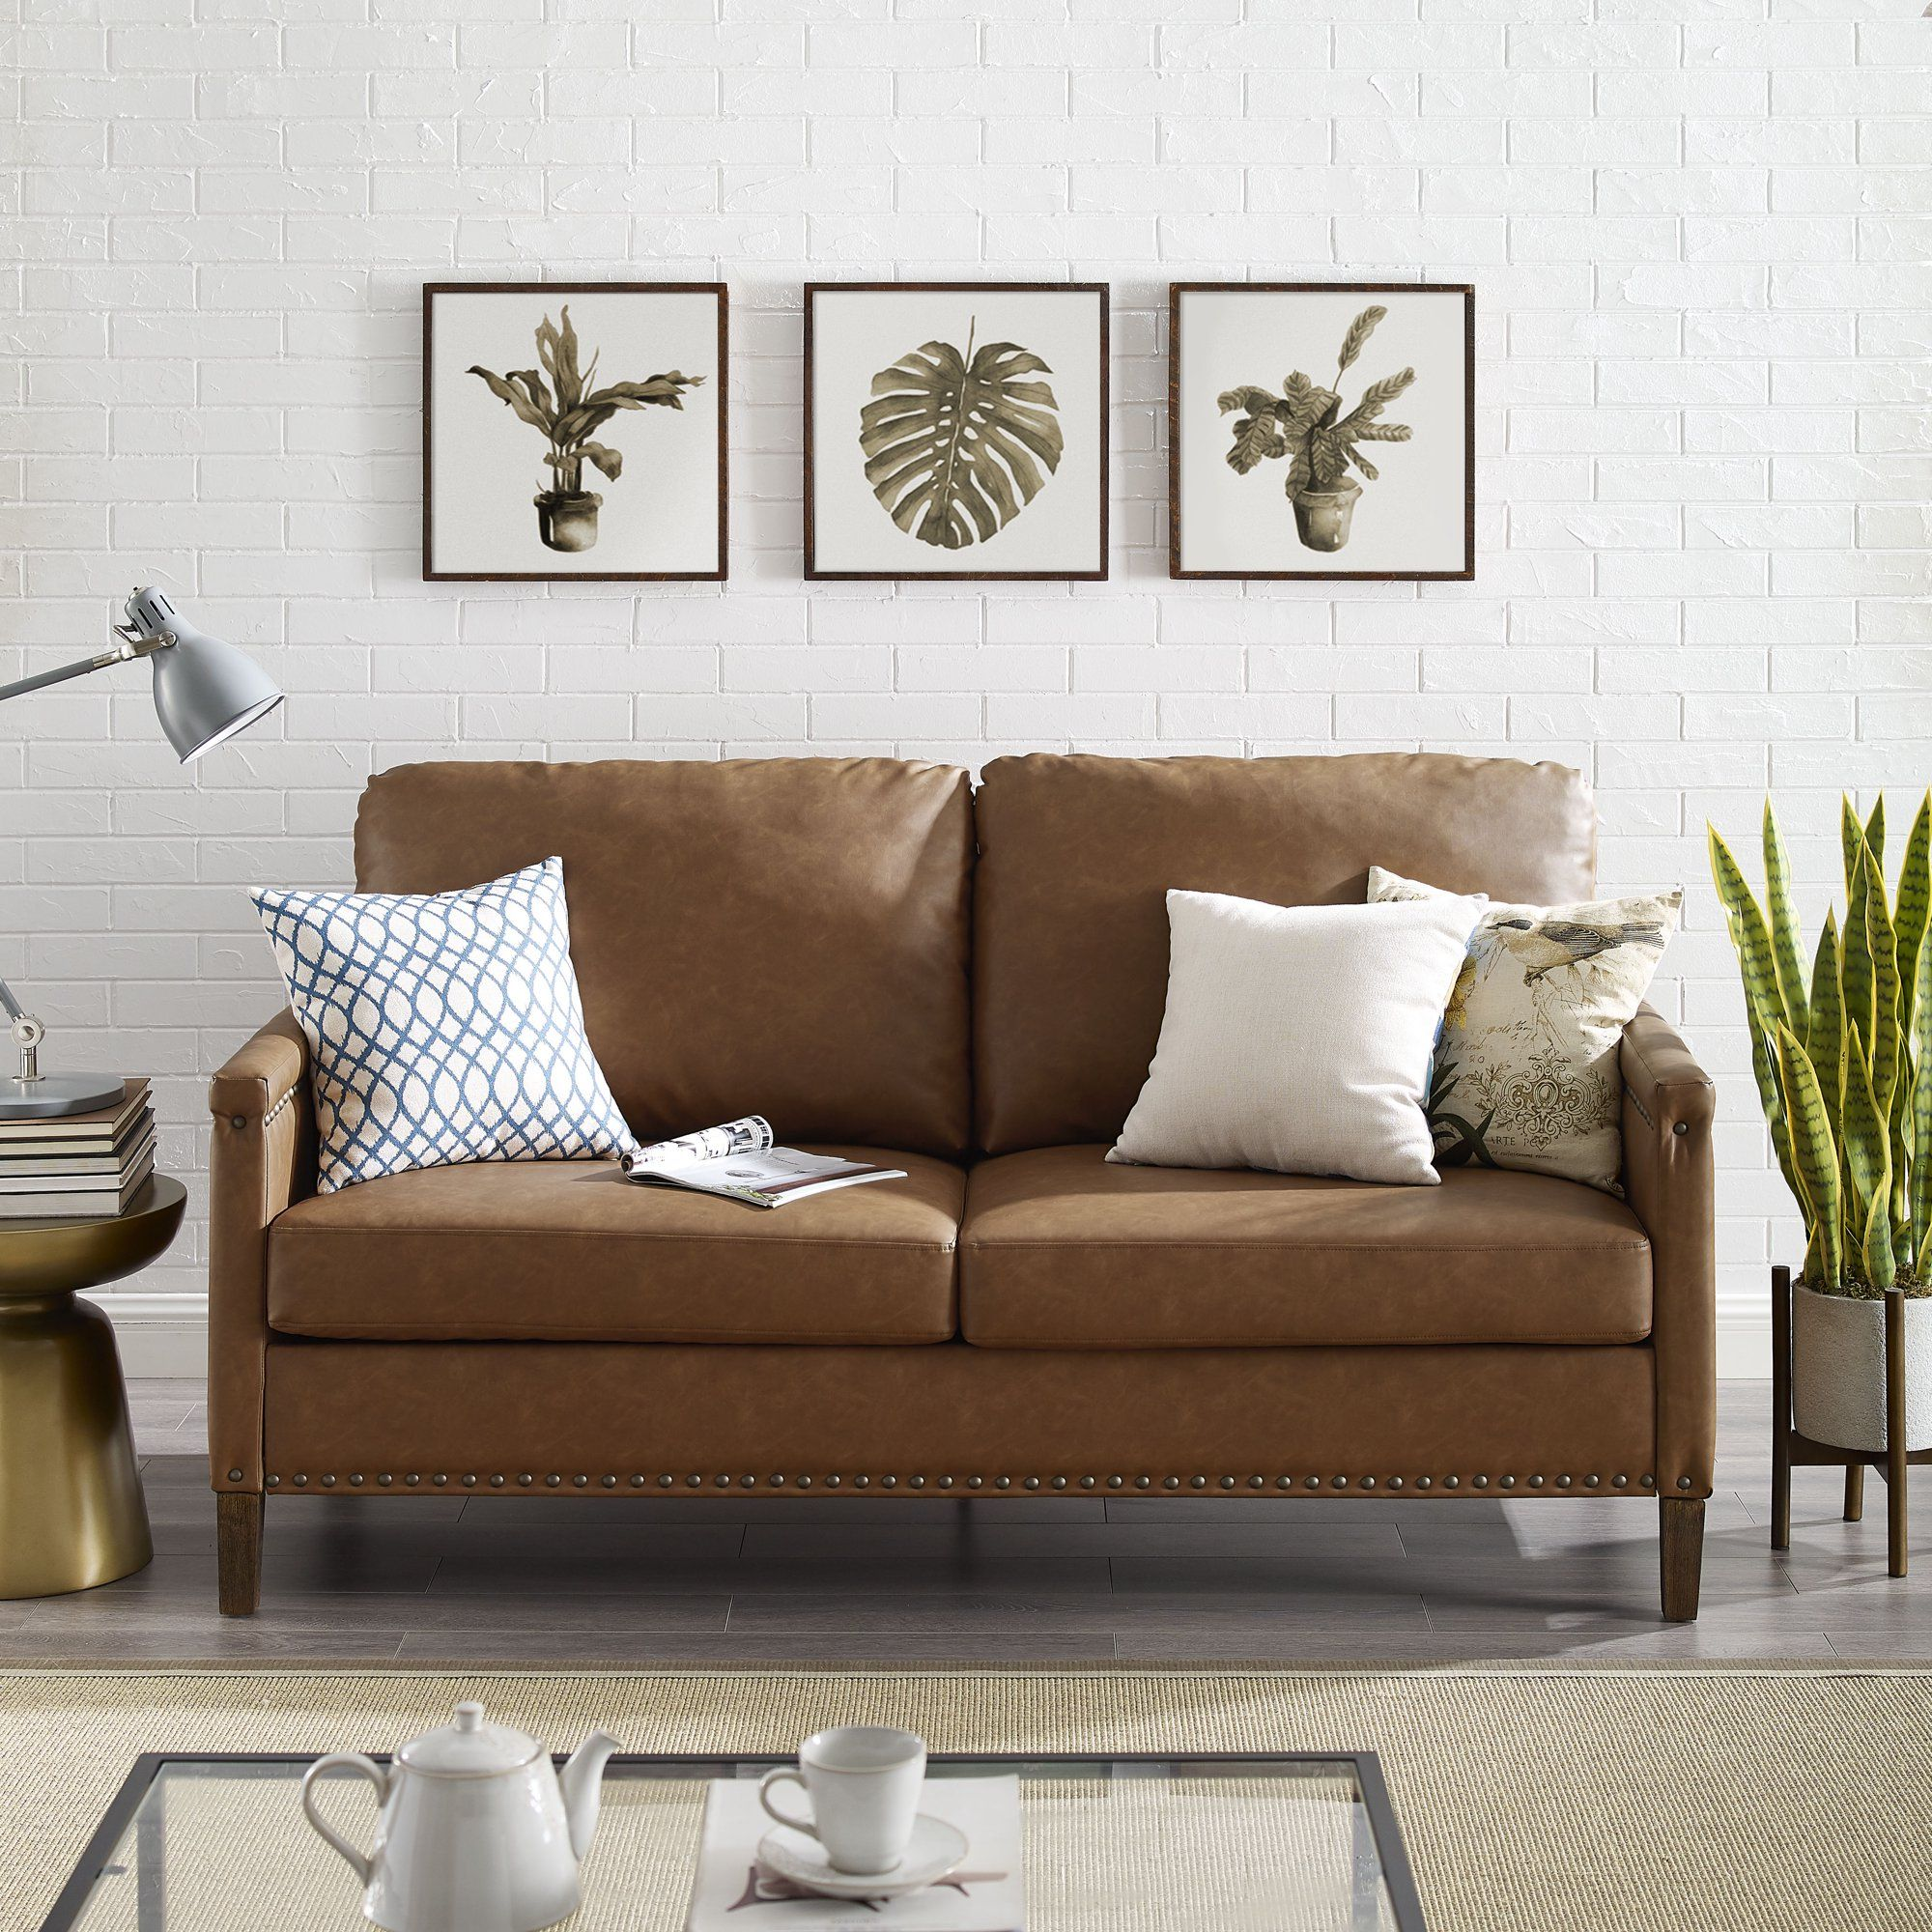 a330c38f77ee62f9f901a903cf01be93 - Better Homes And Gardens Oxford Square Sofa Taupe